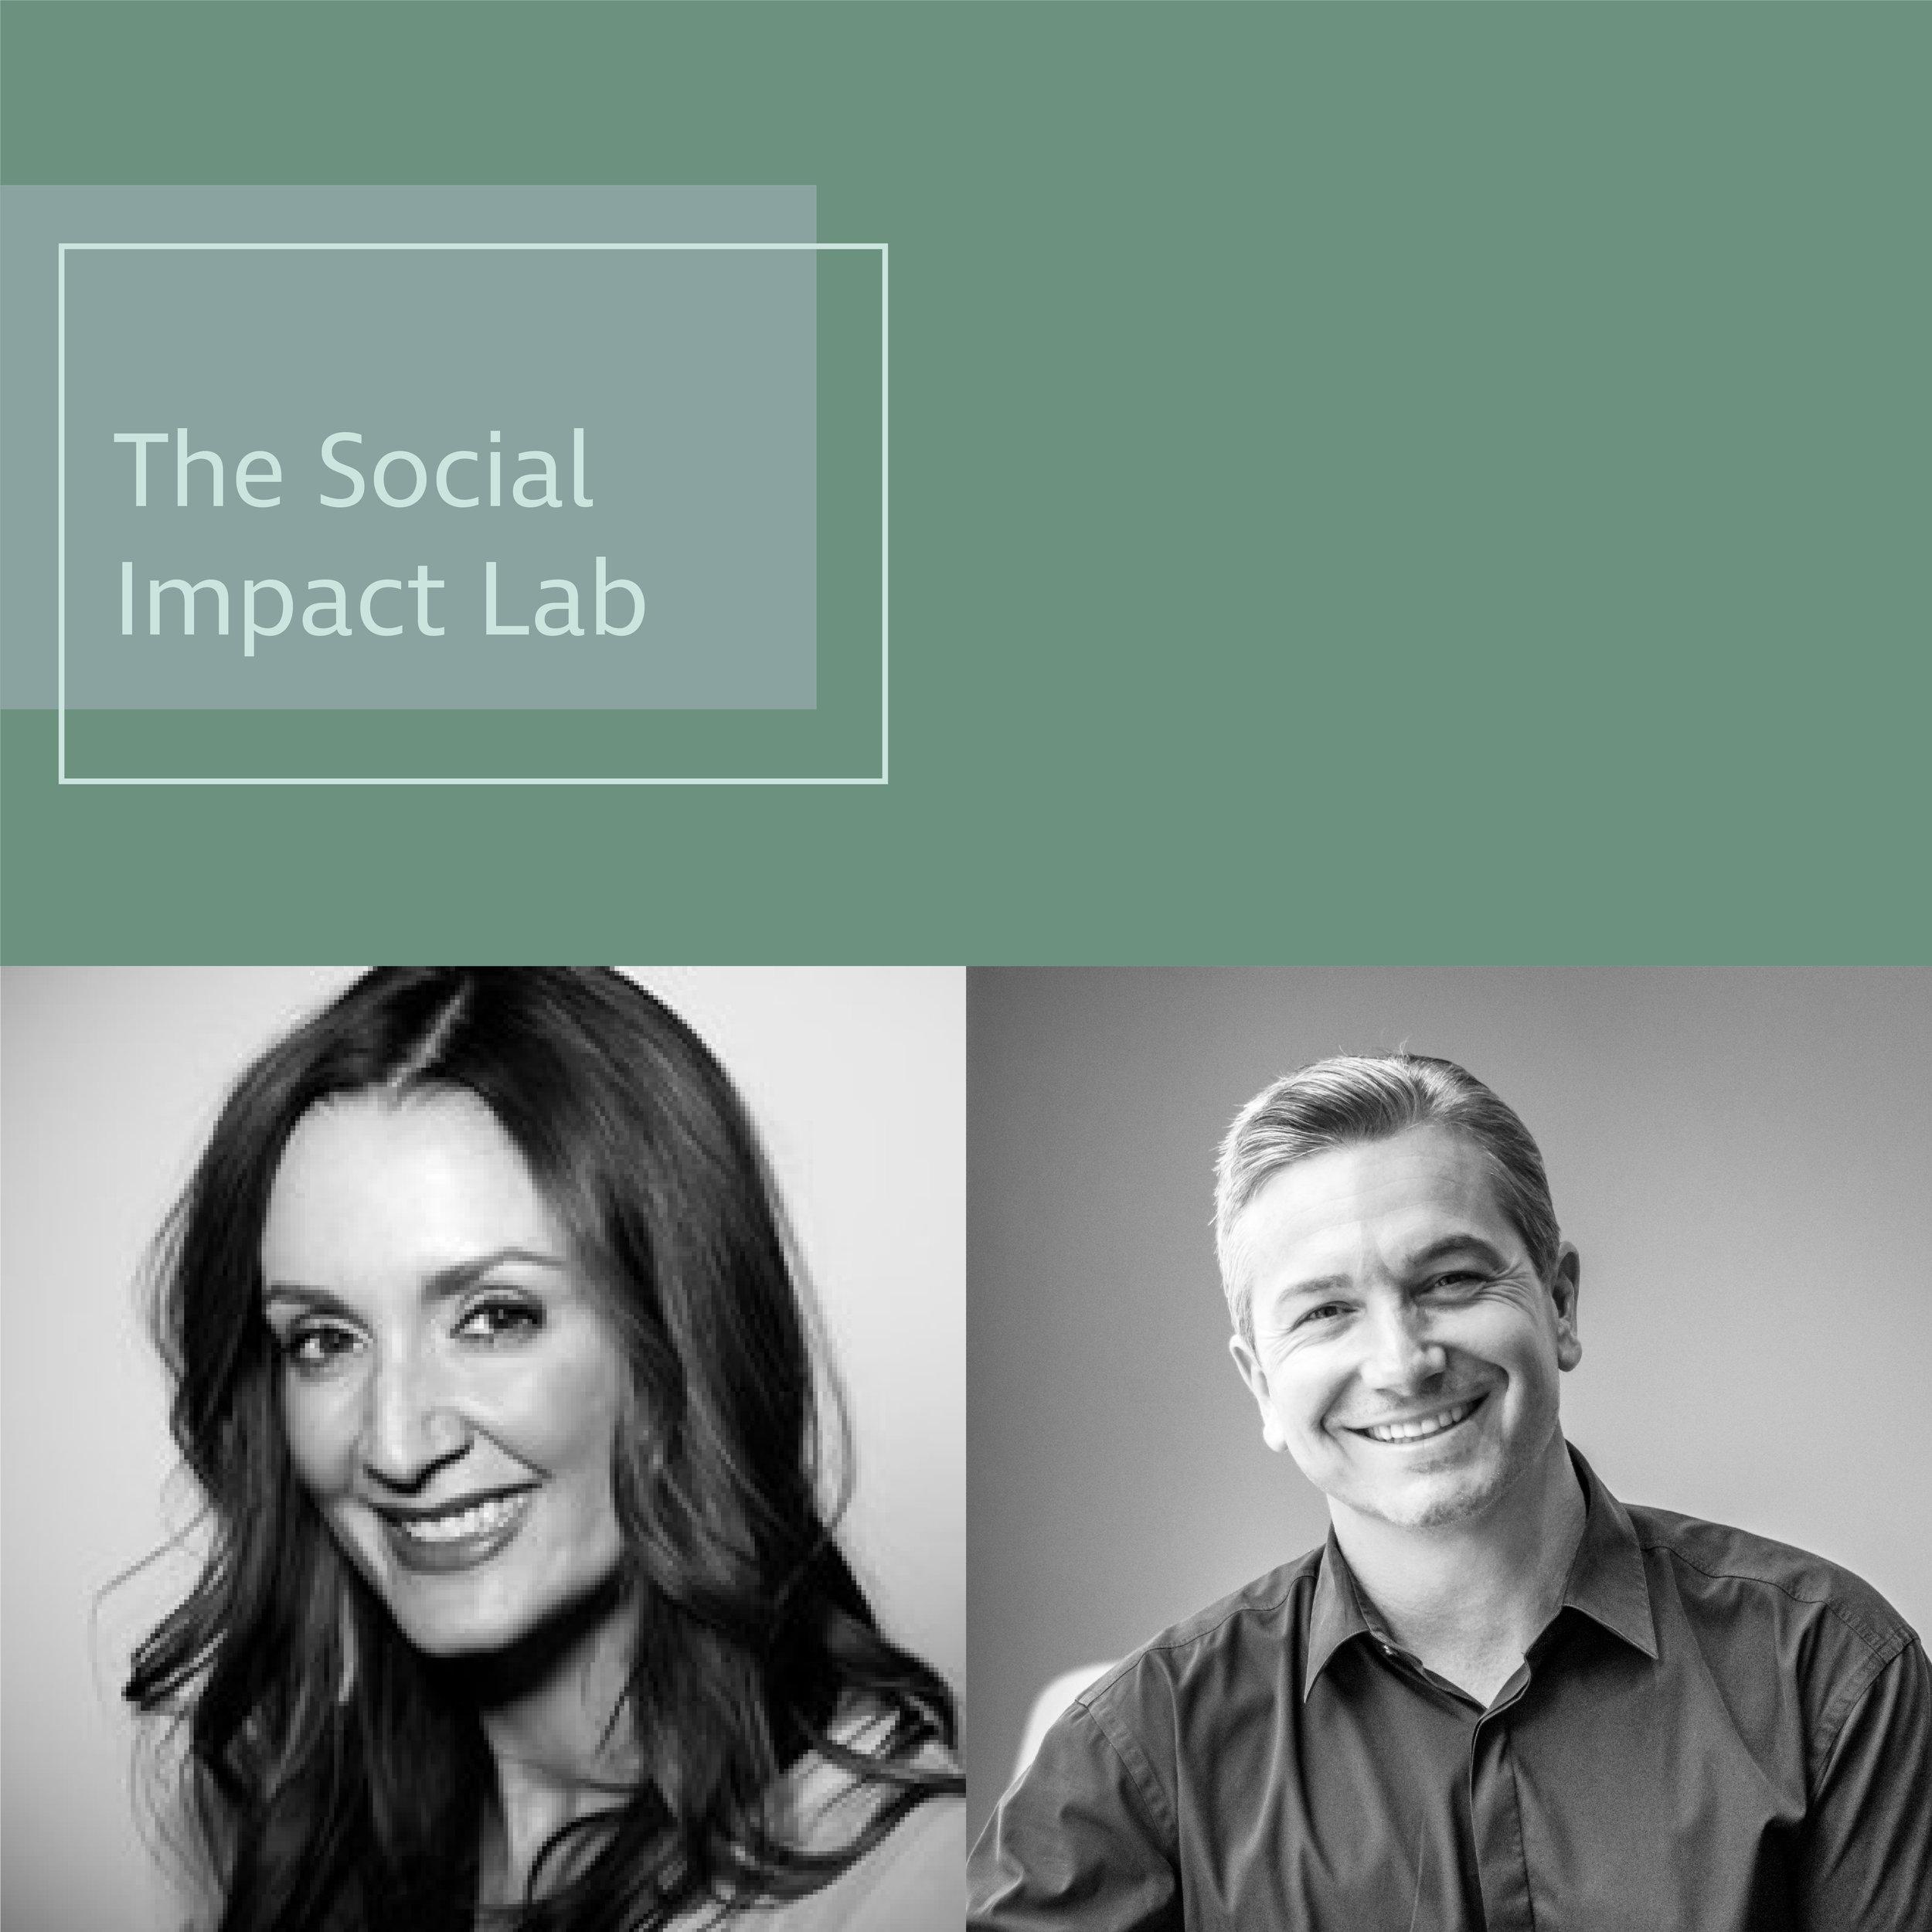 The Social Impact Lab